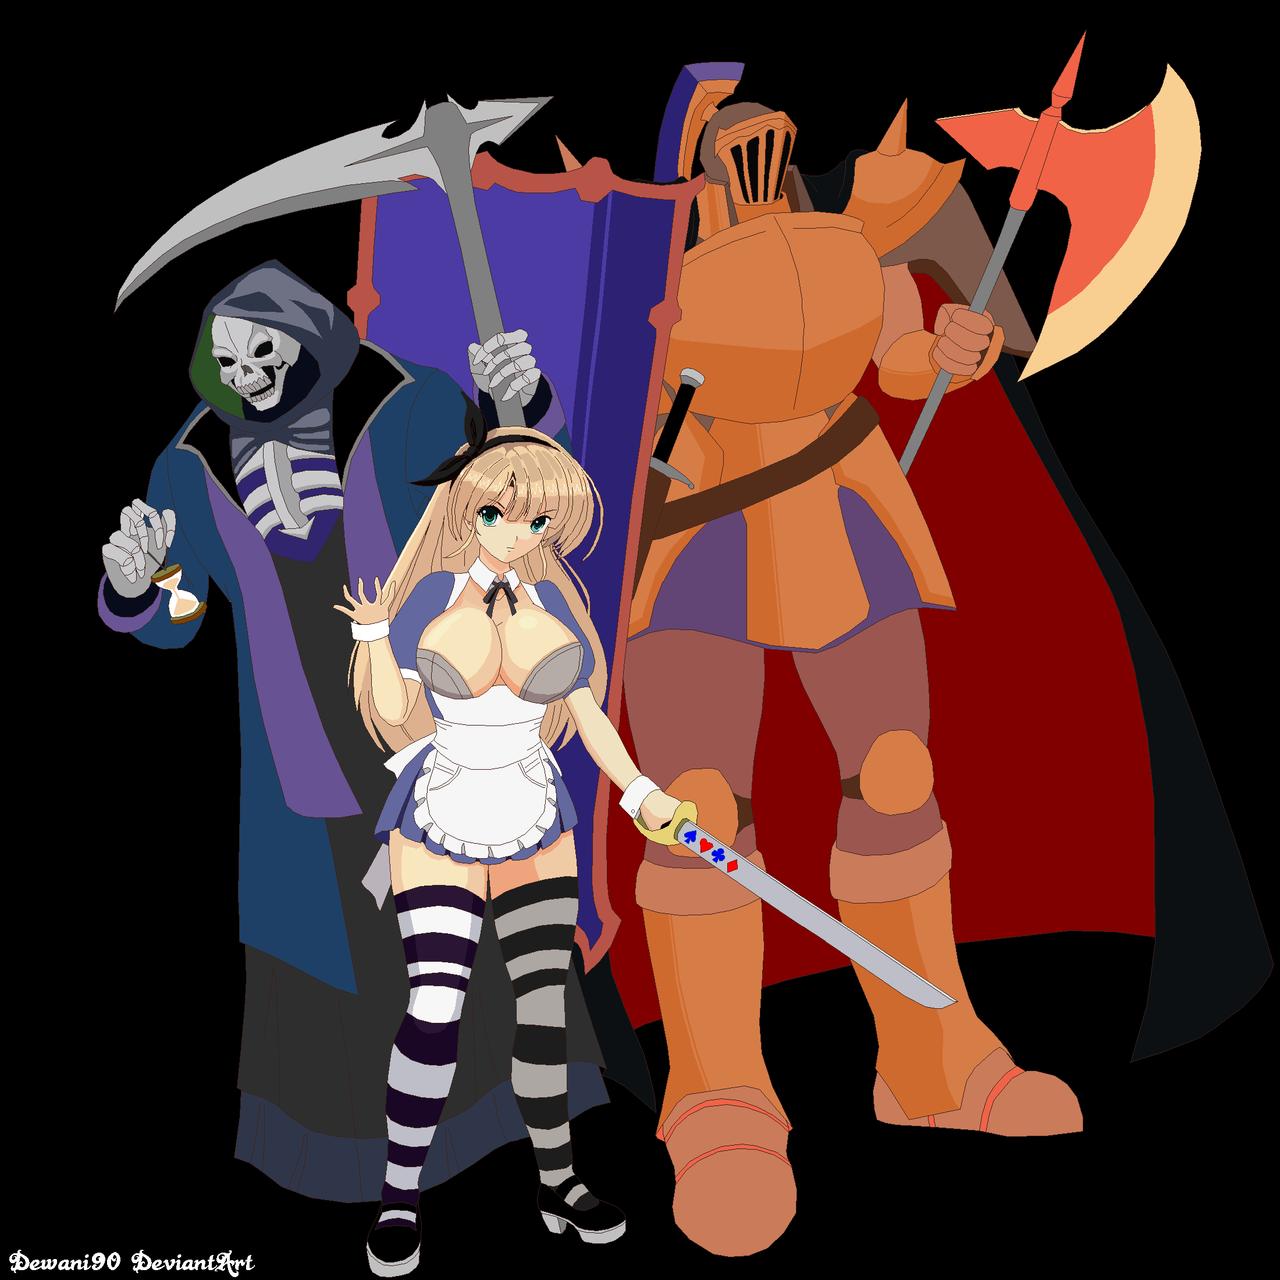 lord dracula's enforcers